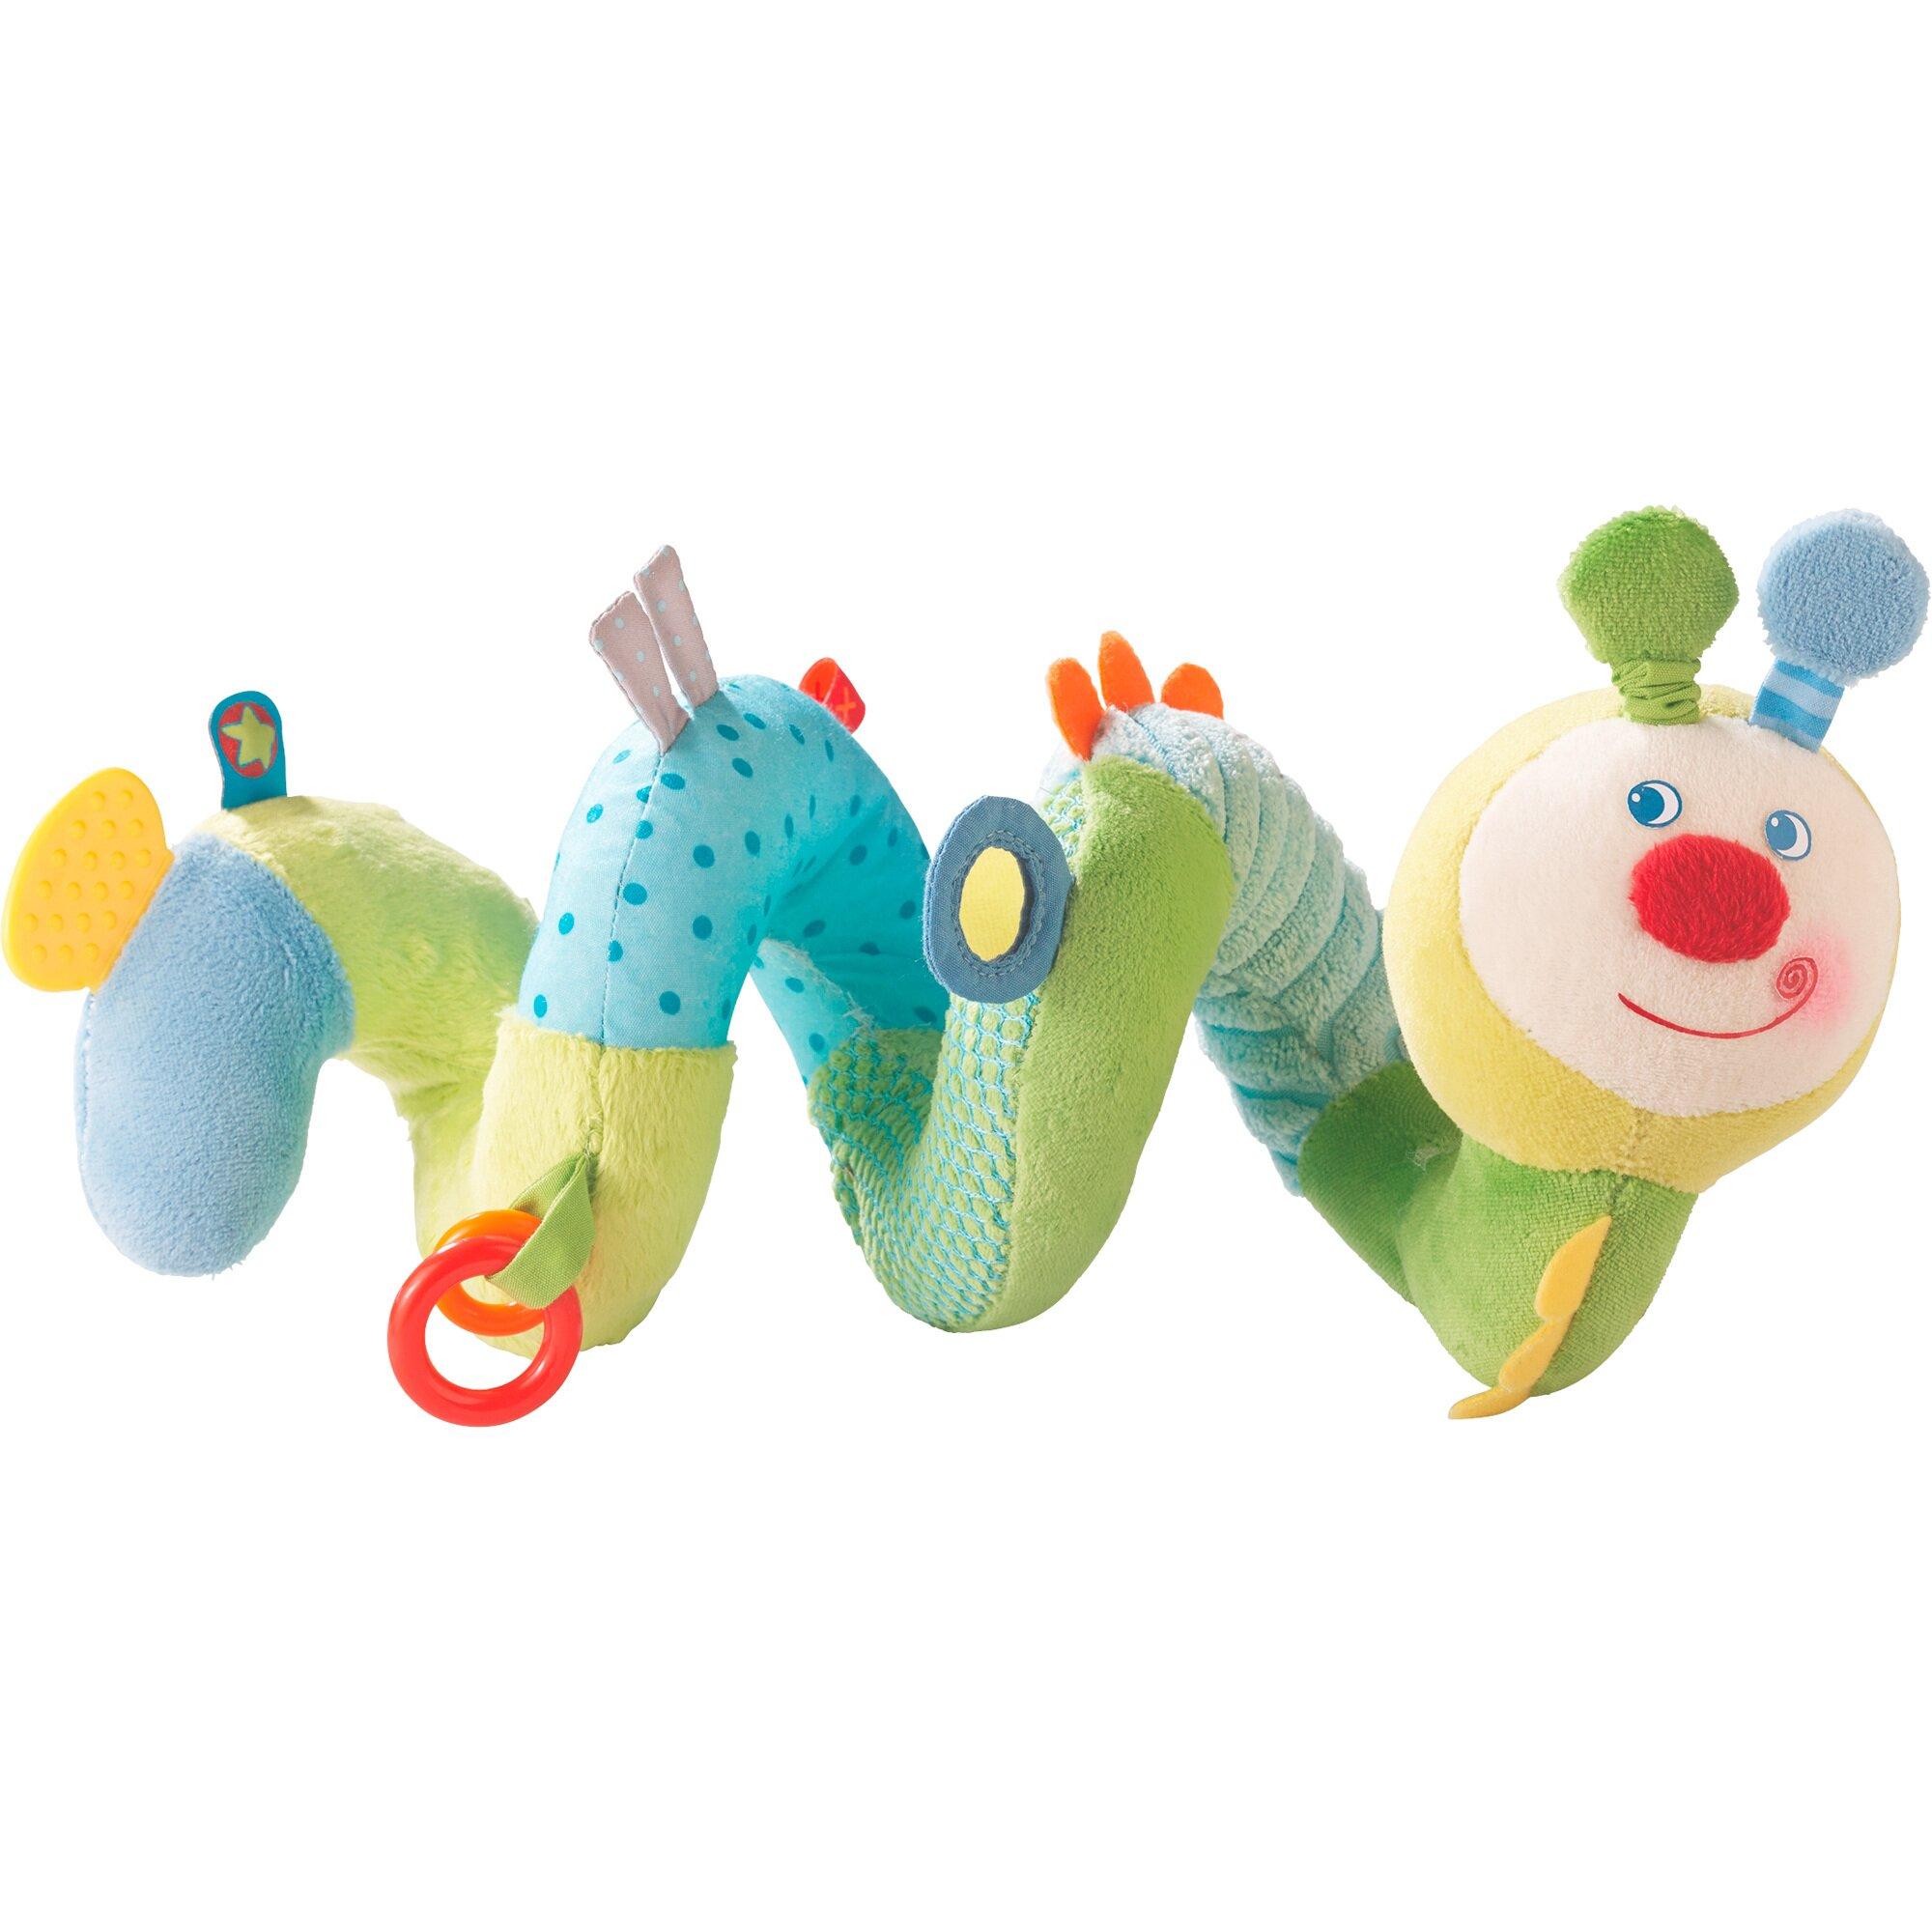 Haba Spielspirale Frühlingswürmchen mehrfarbig